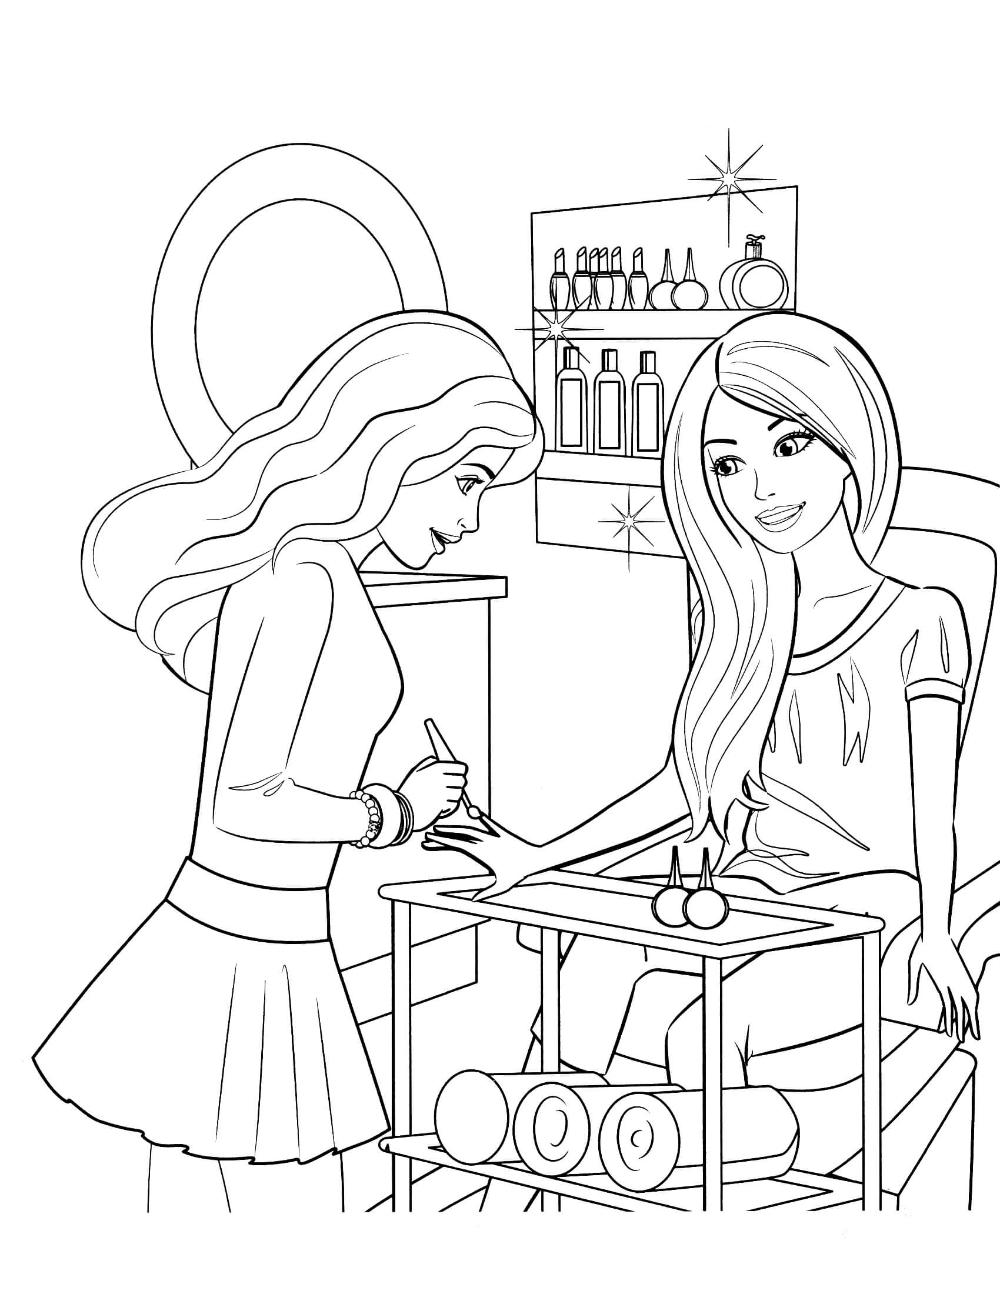 Barbie 33 Coloringcolor Com In 2020 Barbie Coloring Pages Barbie Drawing Barbie Coloring